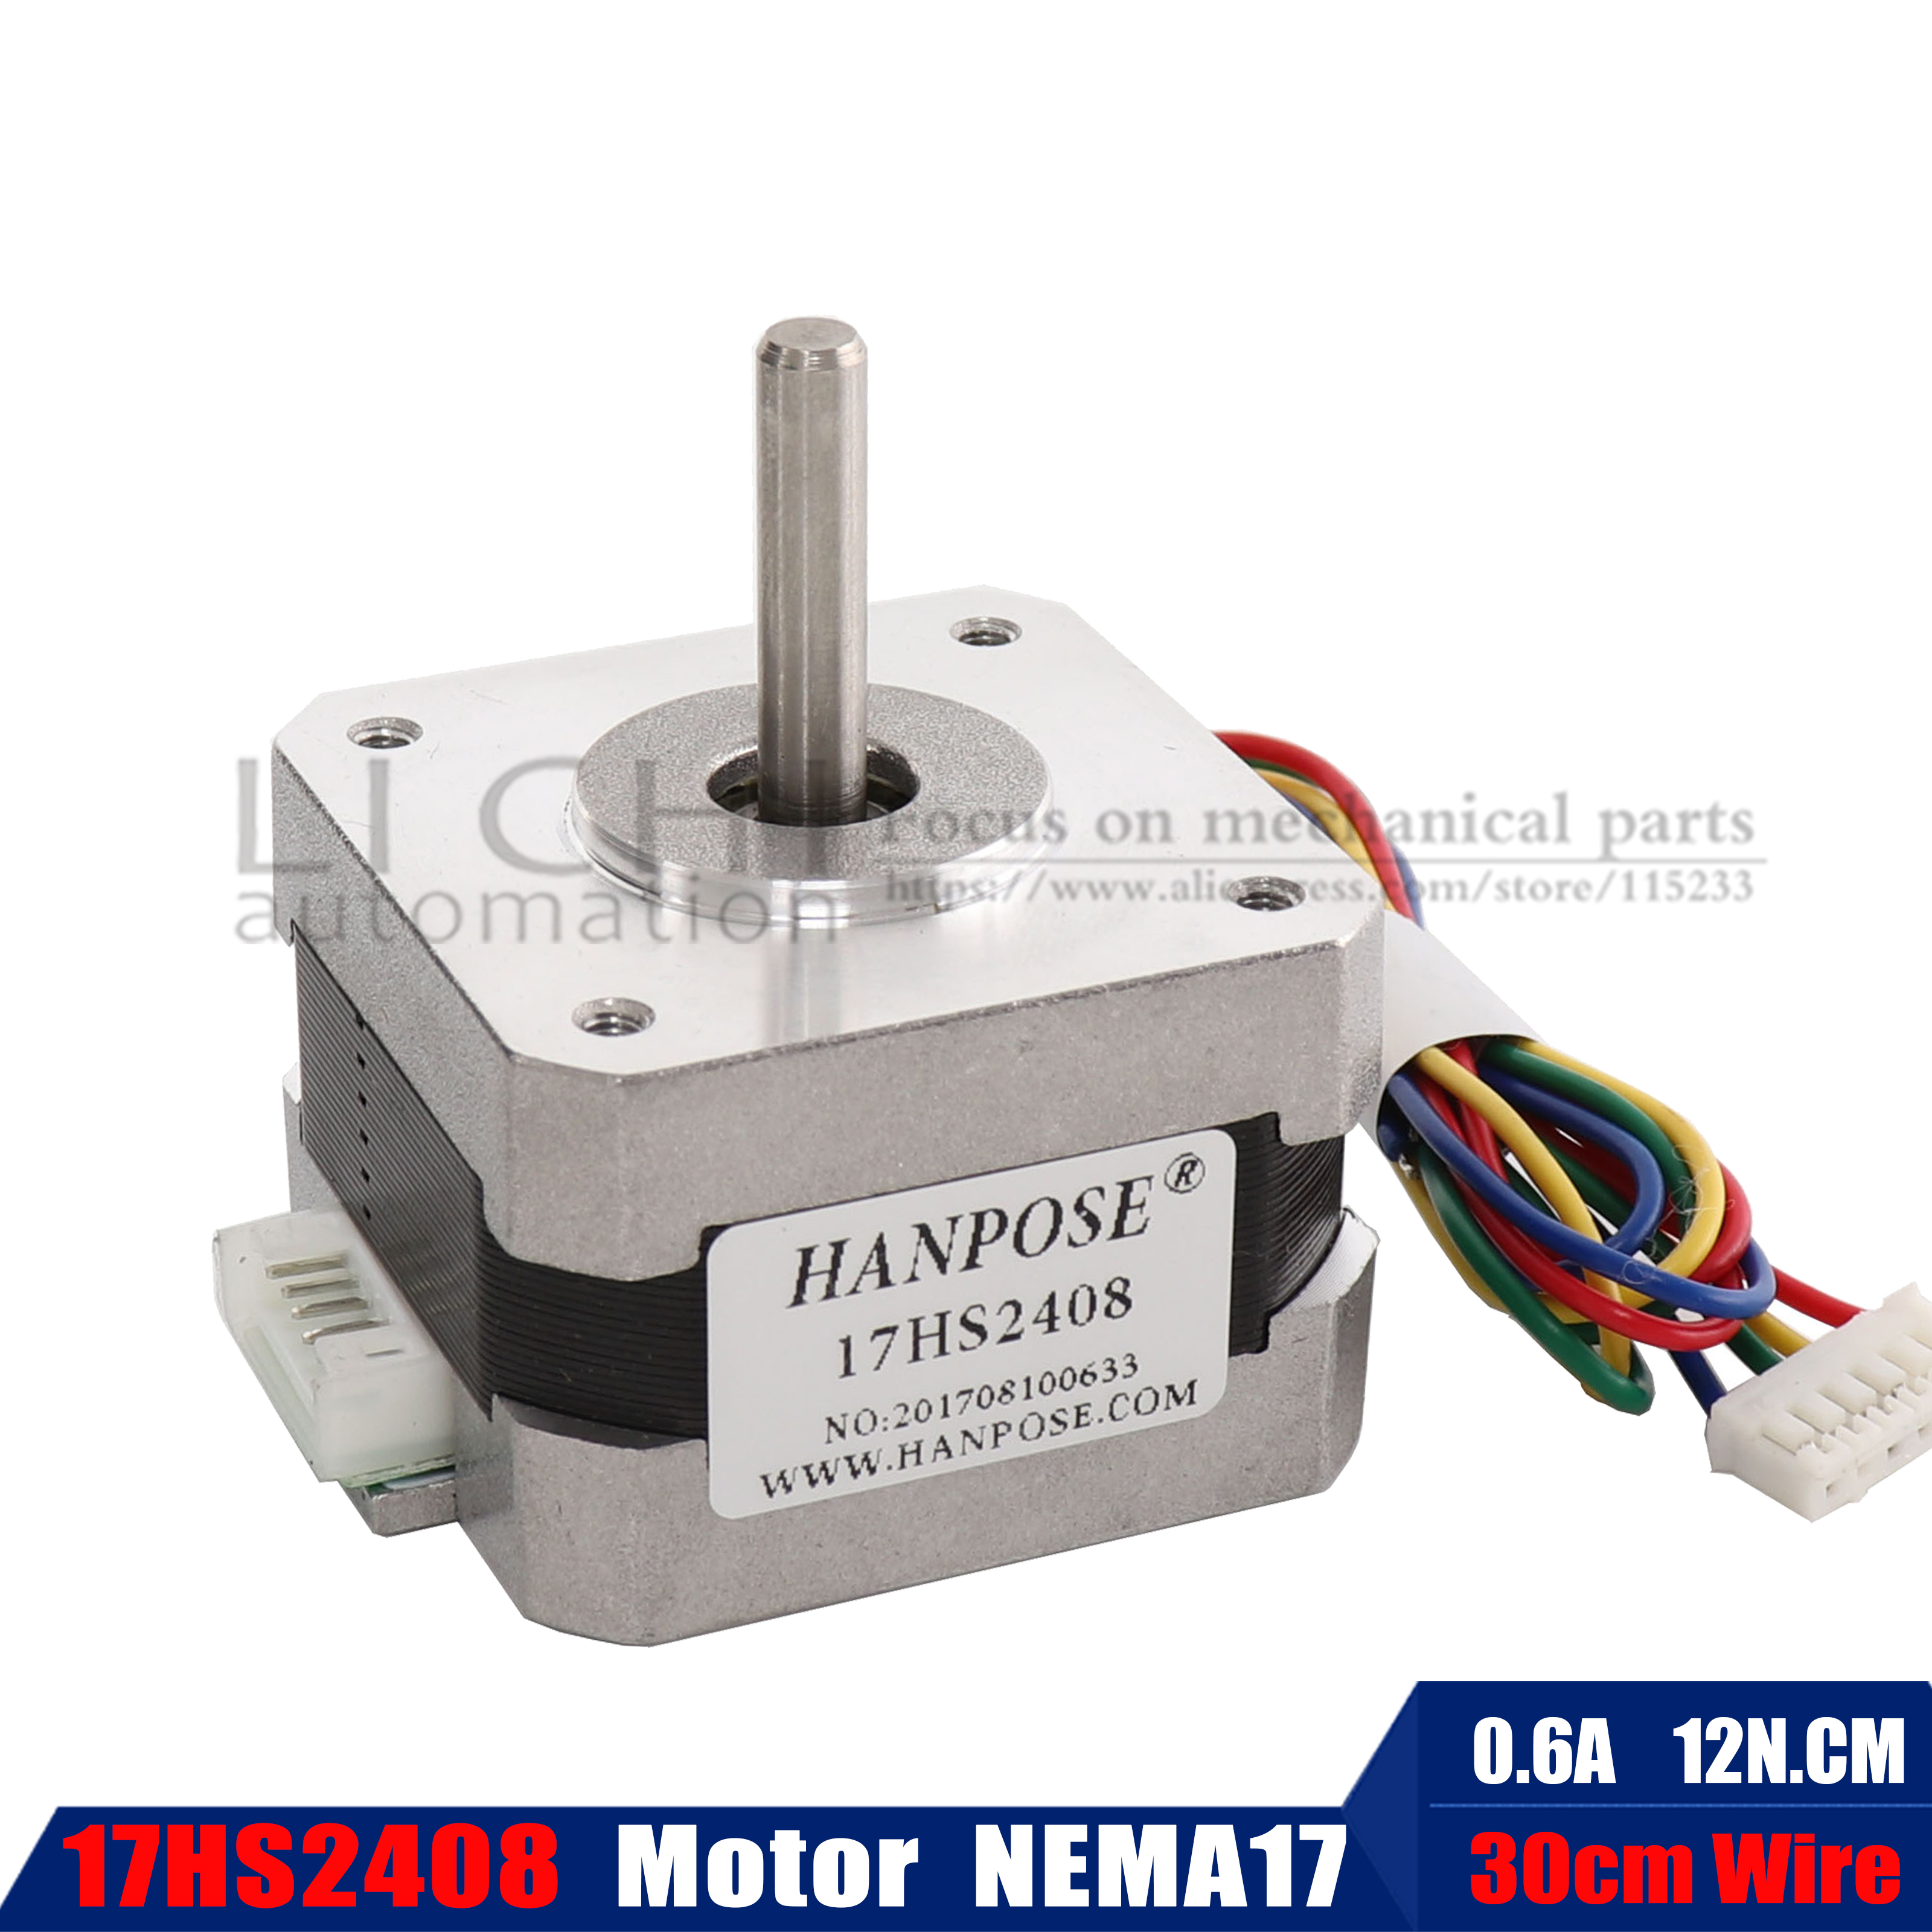 1pcs / Lots 17HS2408 4-lead Nema 17 Stepper Motor 42 Motor 42BYGH 0.6A CE ROSH ISO CNC Laser Grind Foam Plasma Cut